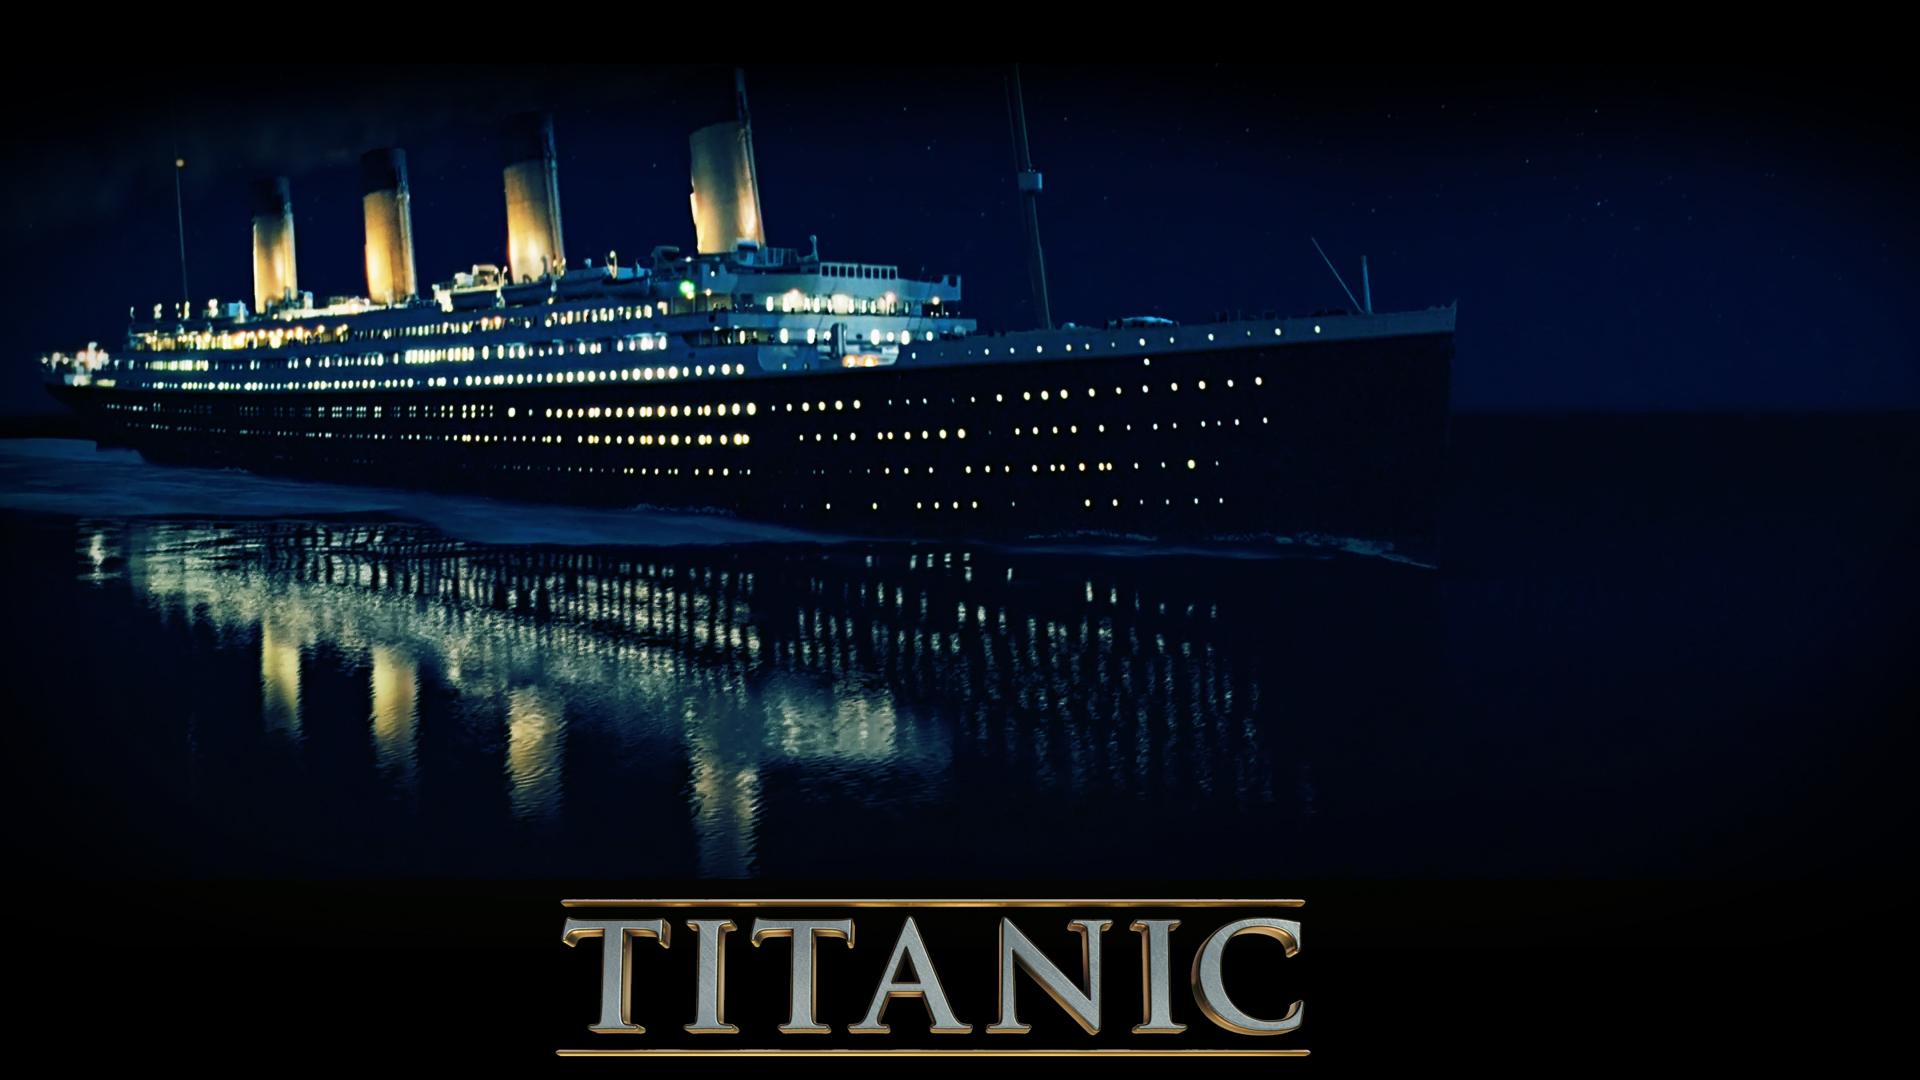 Titanic-in-3D-Wallpapers-1920x1080-8.jpg